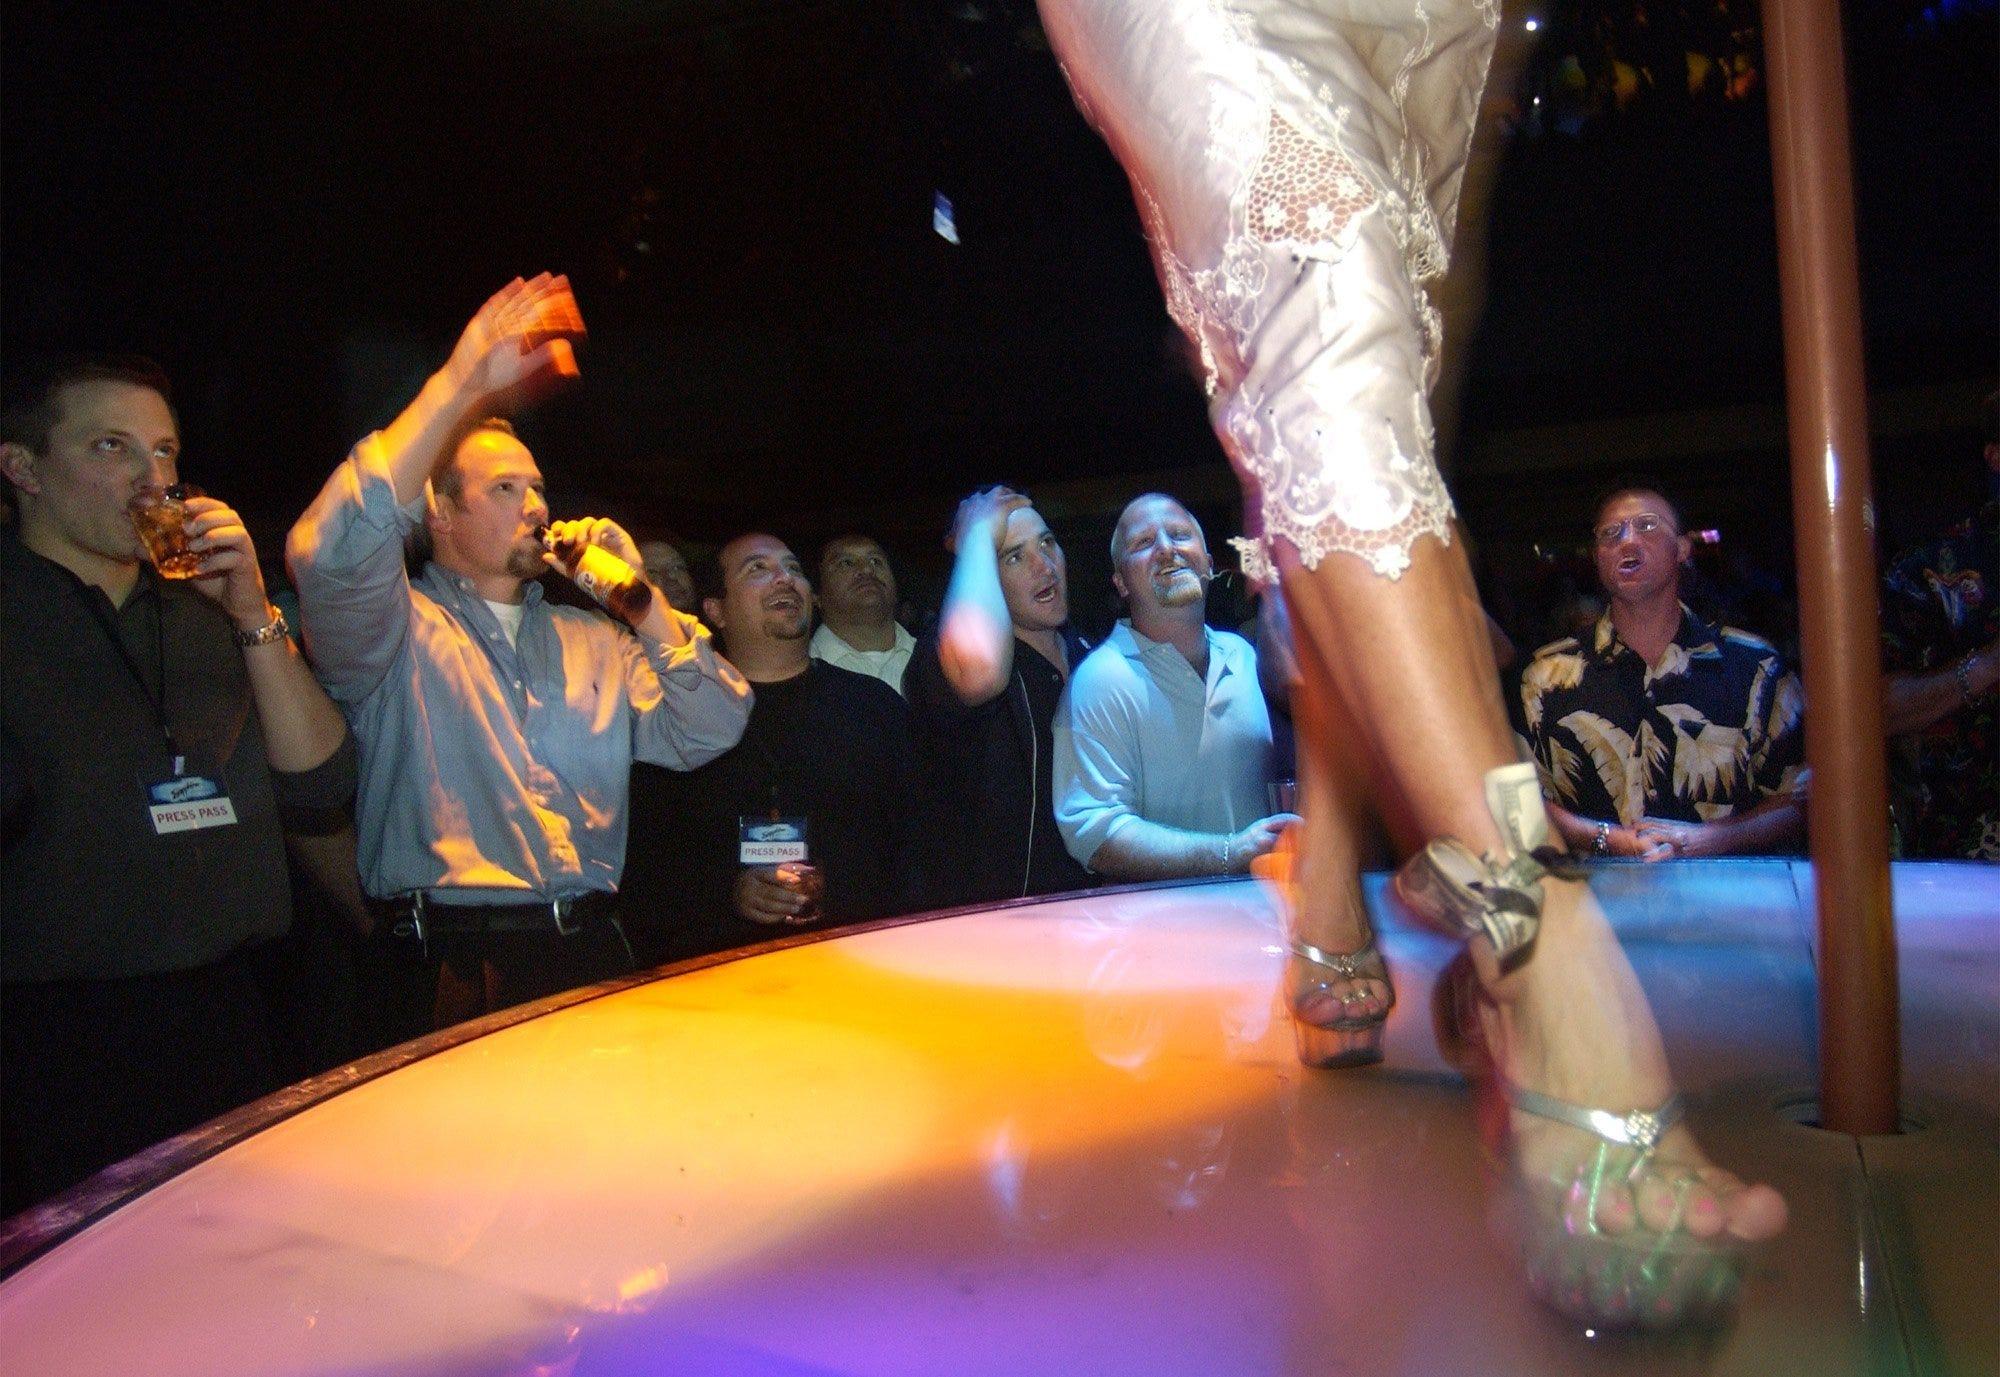 Reno strip club